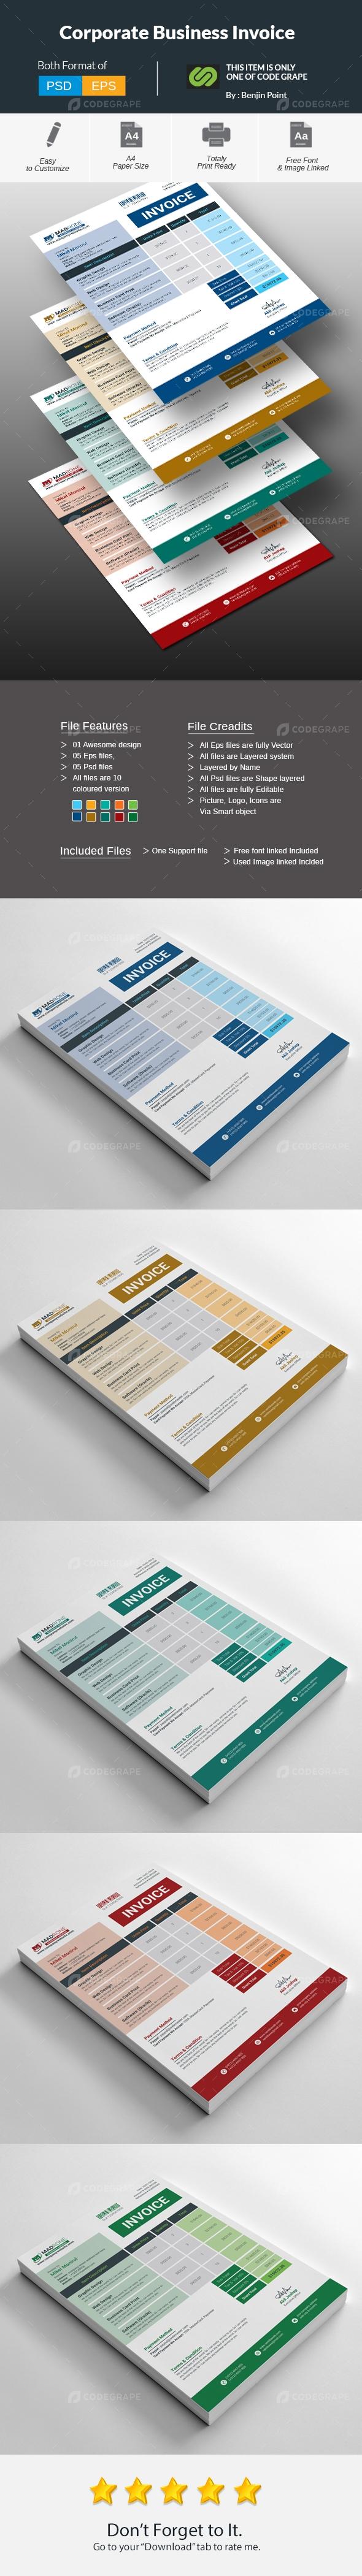 Corporate Business Invoice